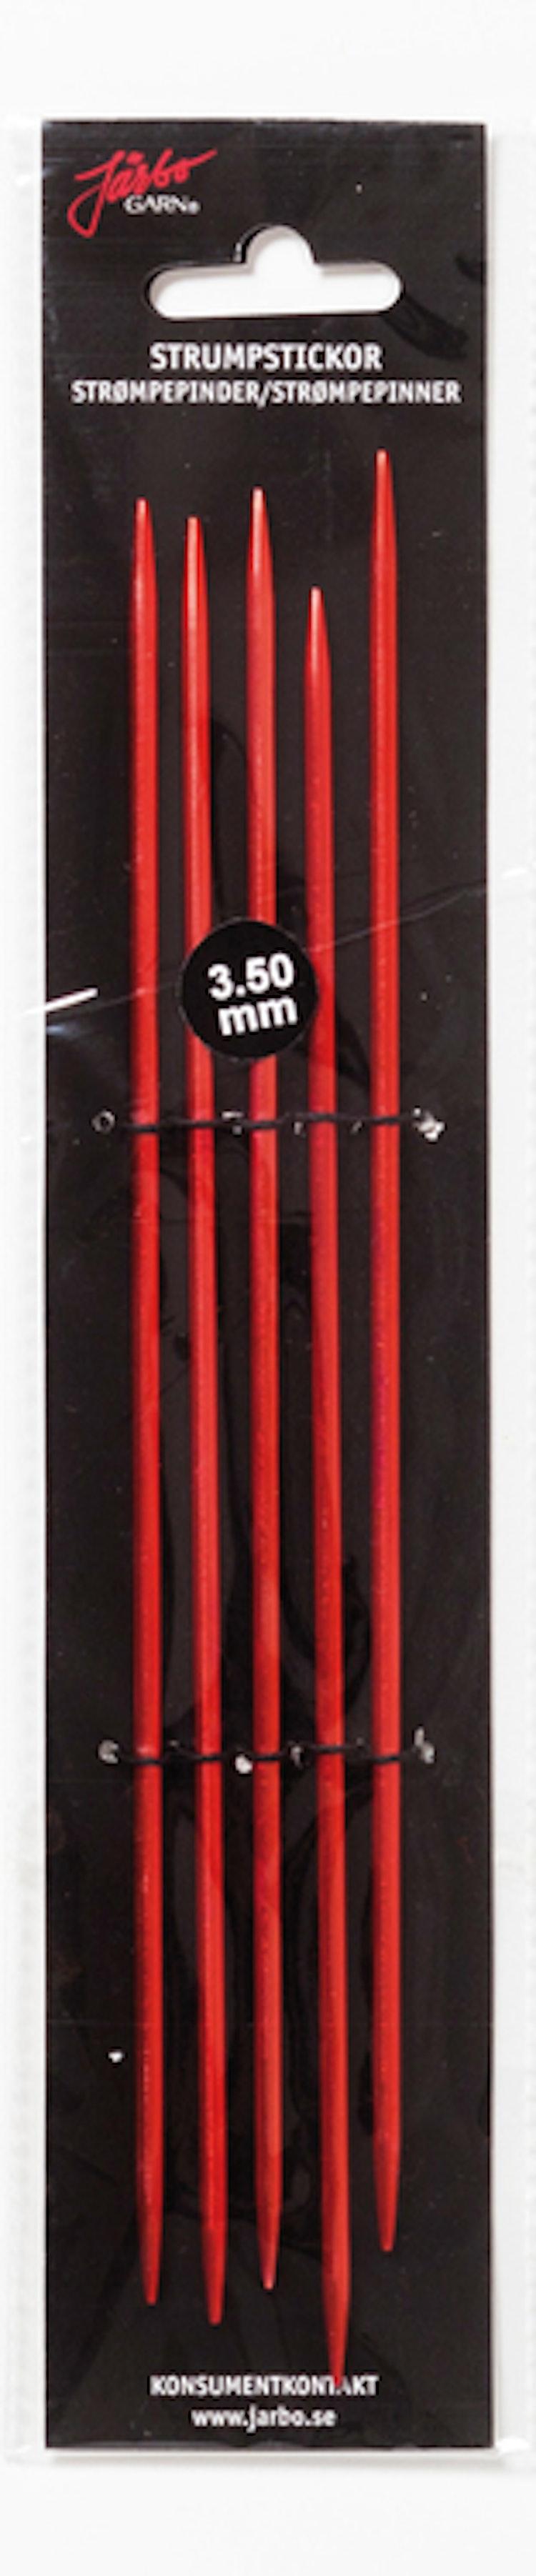 Strumpstickor RÖD , 15 cm